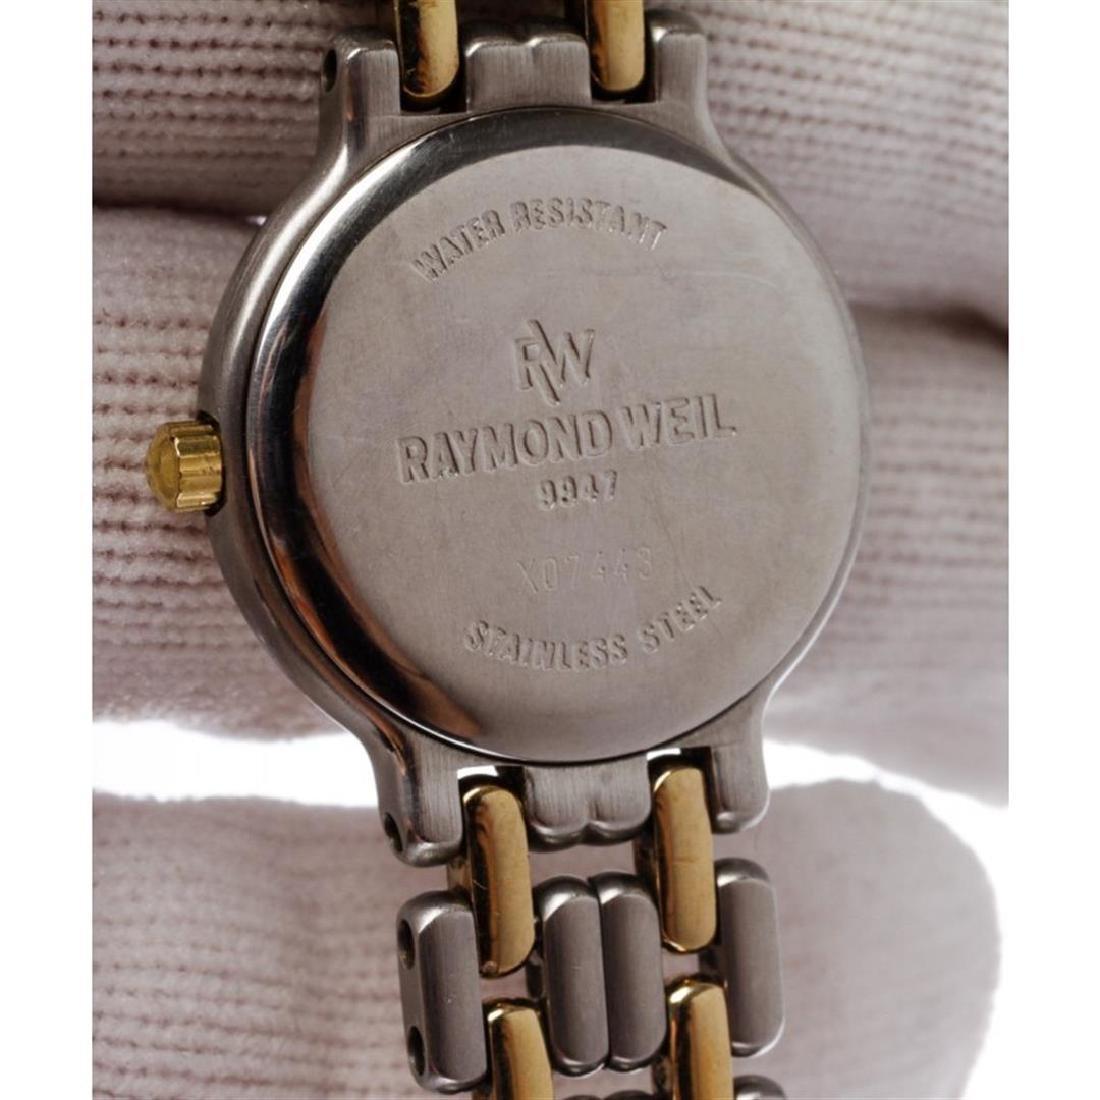 Raymond Weil Geneve Quartz Stainless Steel Wristwatch - 6